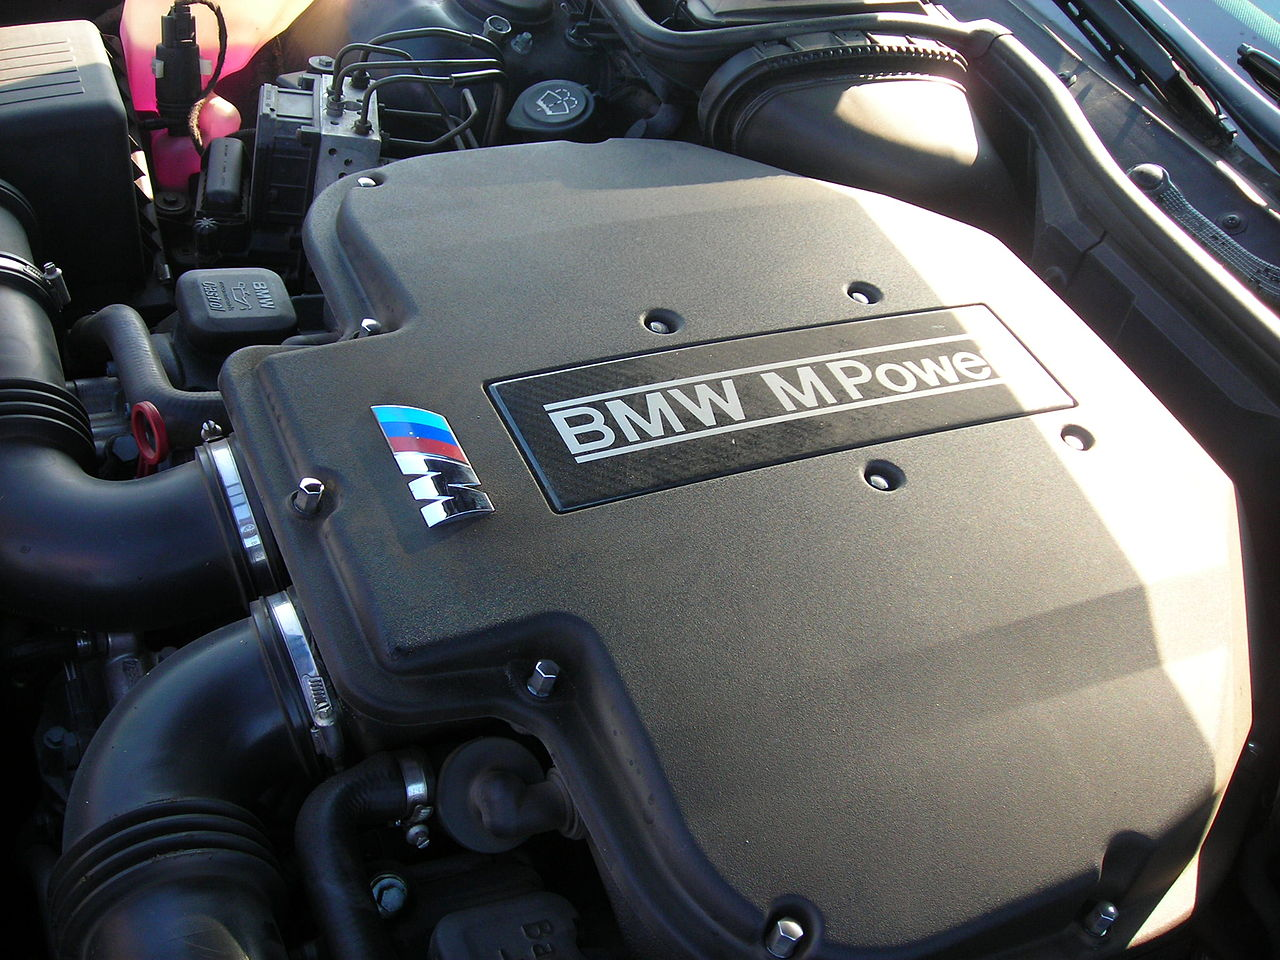 similiar bmw li engine diagram keywords bmw vacuum hose diagram together 2001 bmw secondary air pump